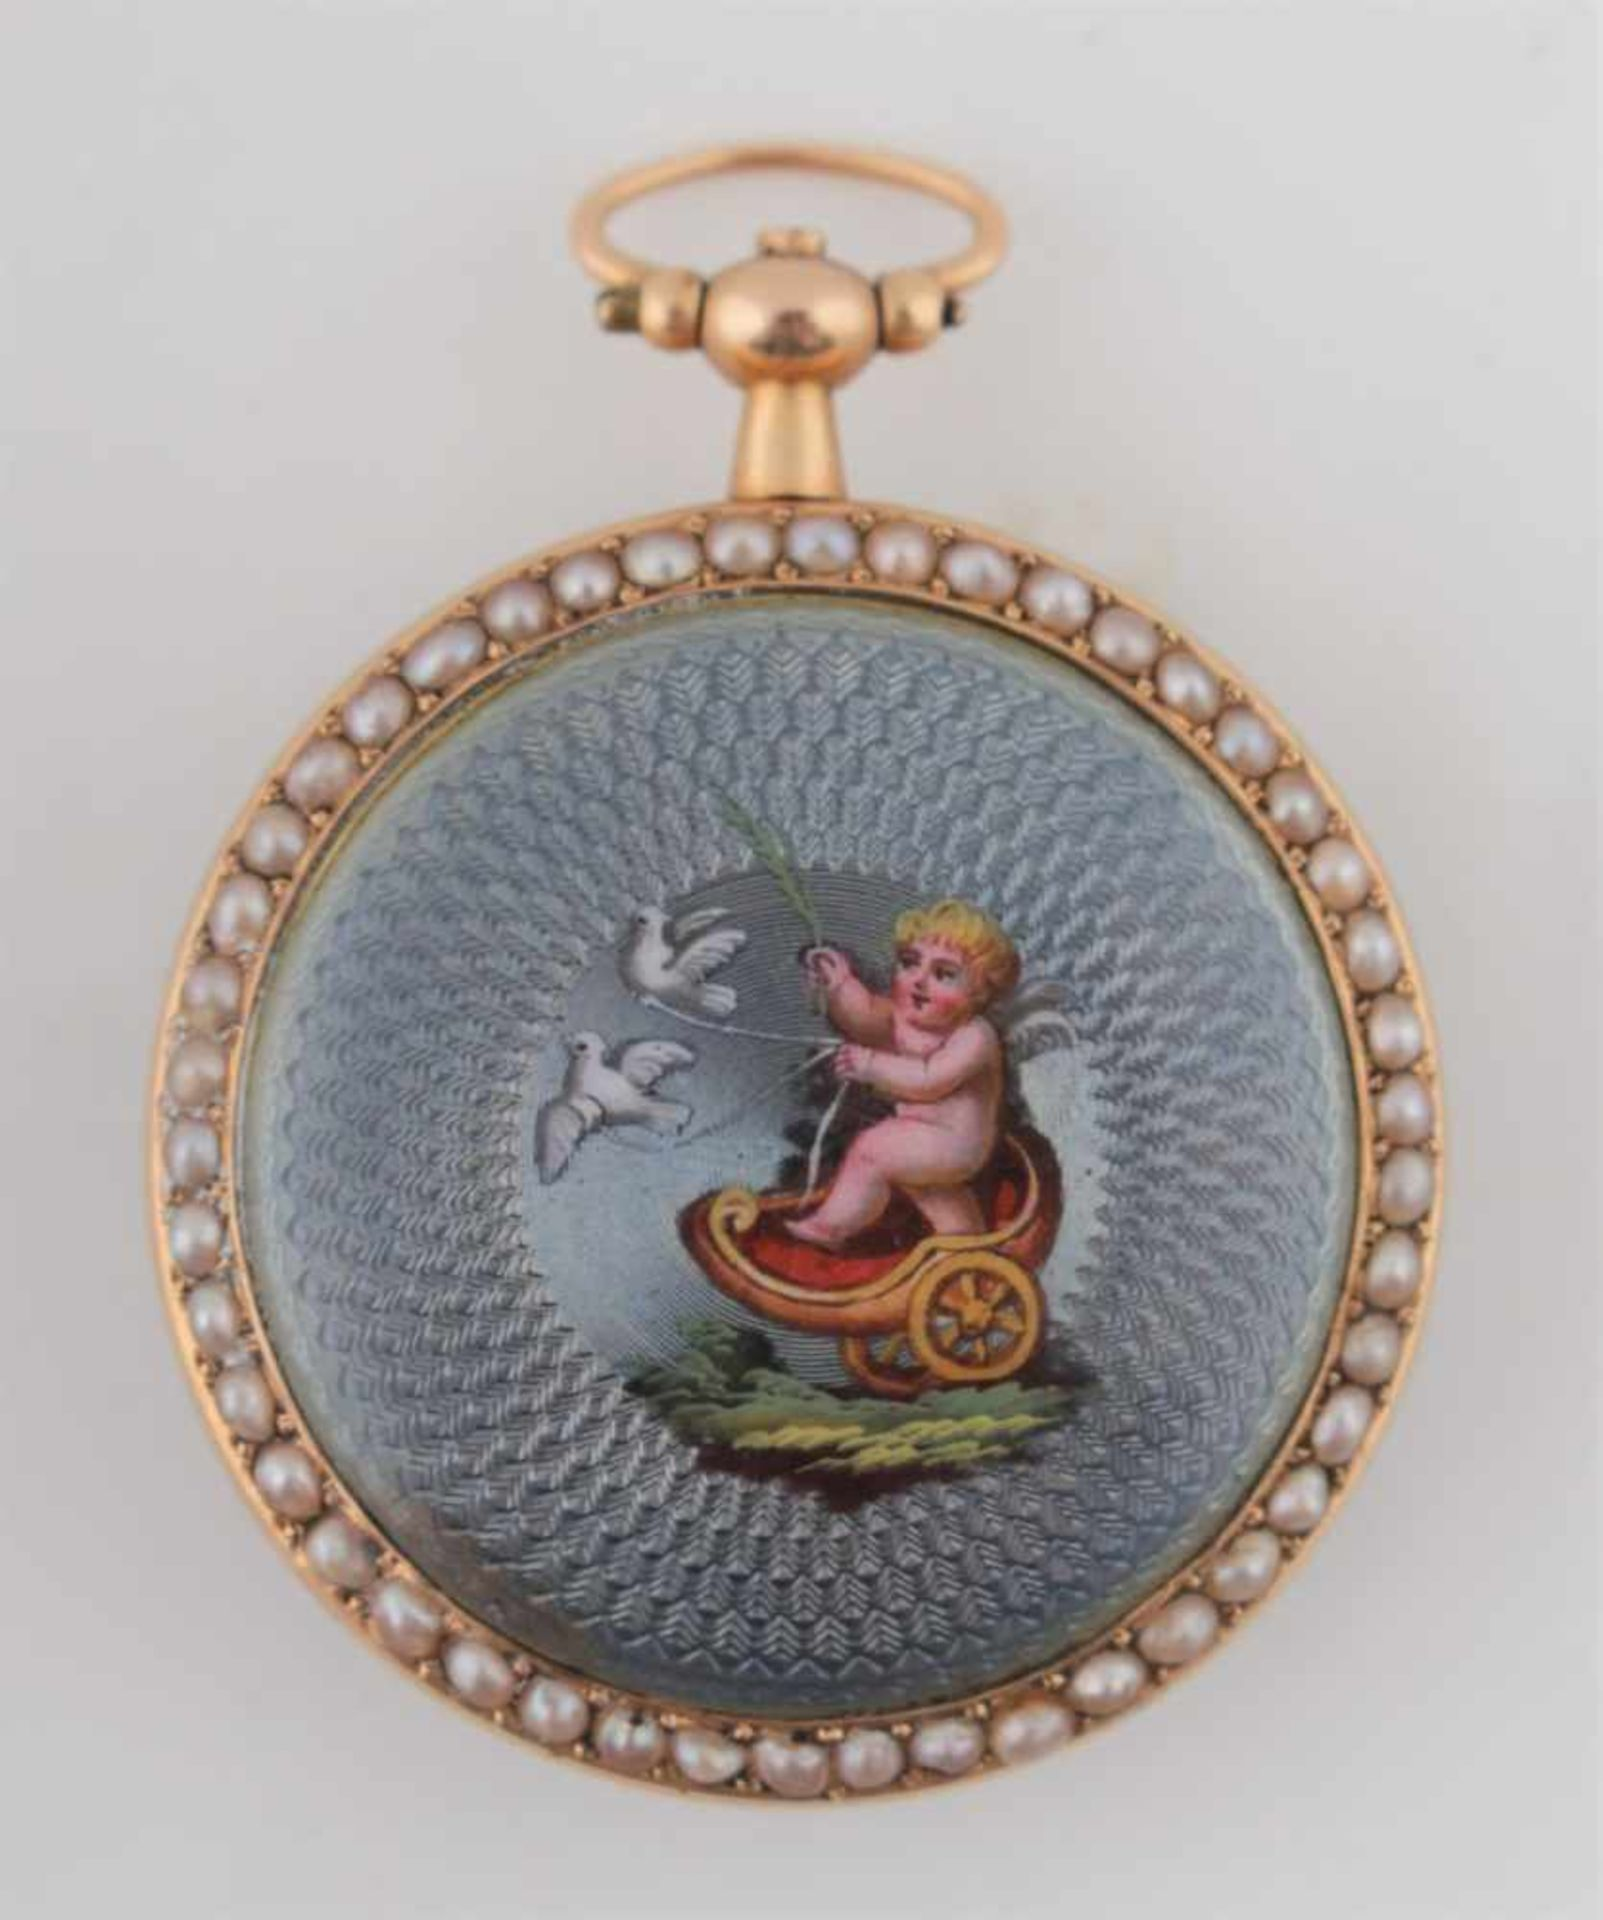 Los 14 - Pocket watch decorated with figurative enamel Switzerland, Geneva, 1st half of the 19th century,